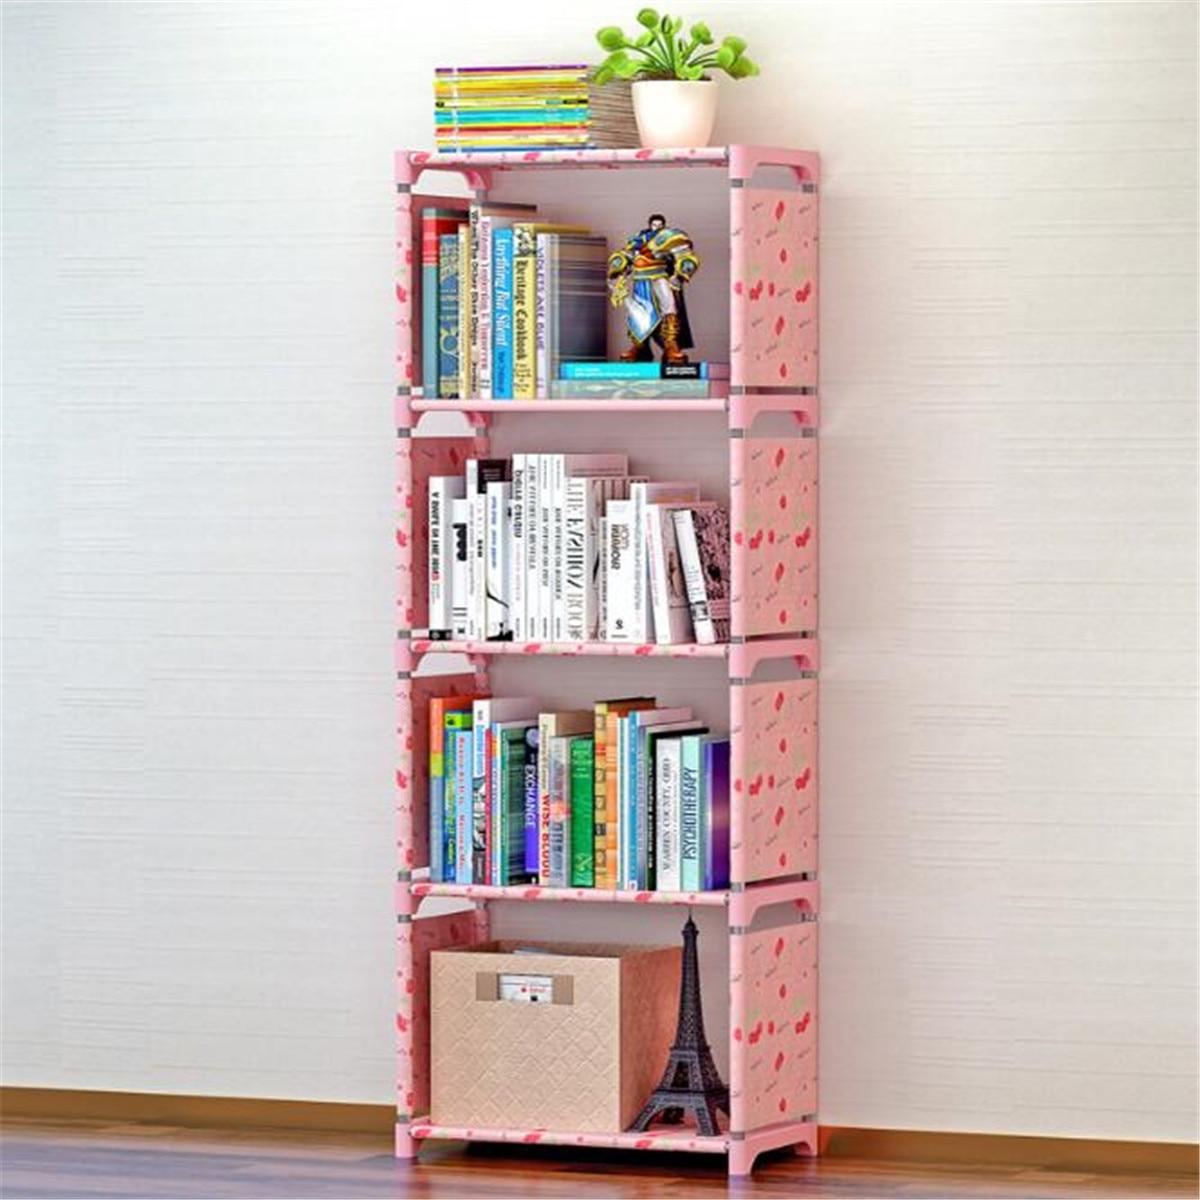 Simple Bookshelf Book Storage Shelf For Books Plants Sundries Furniture DIY Combination Shelf Floor Standing Children Bookcase